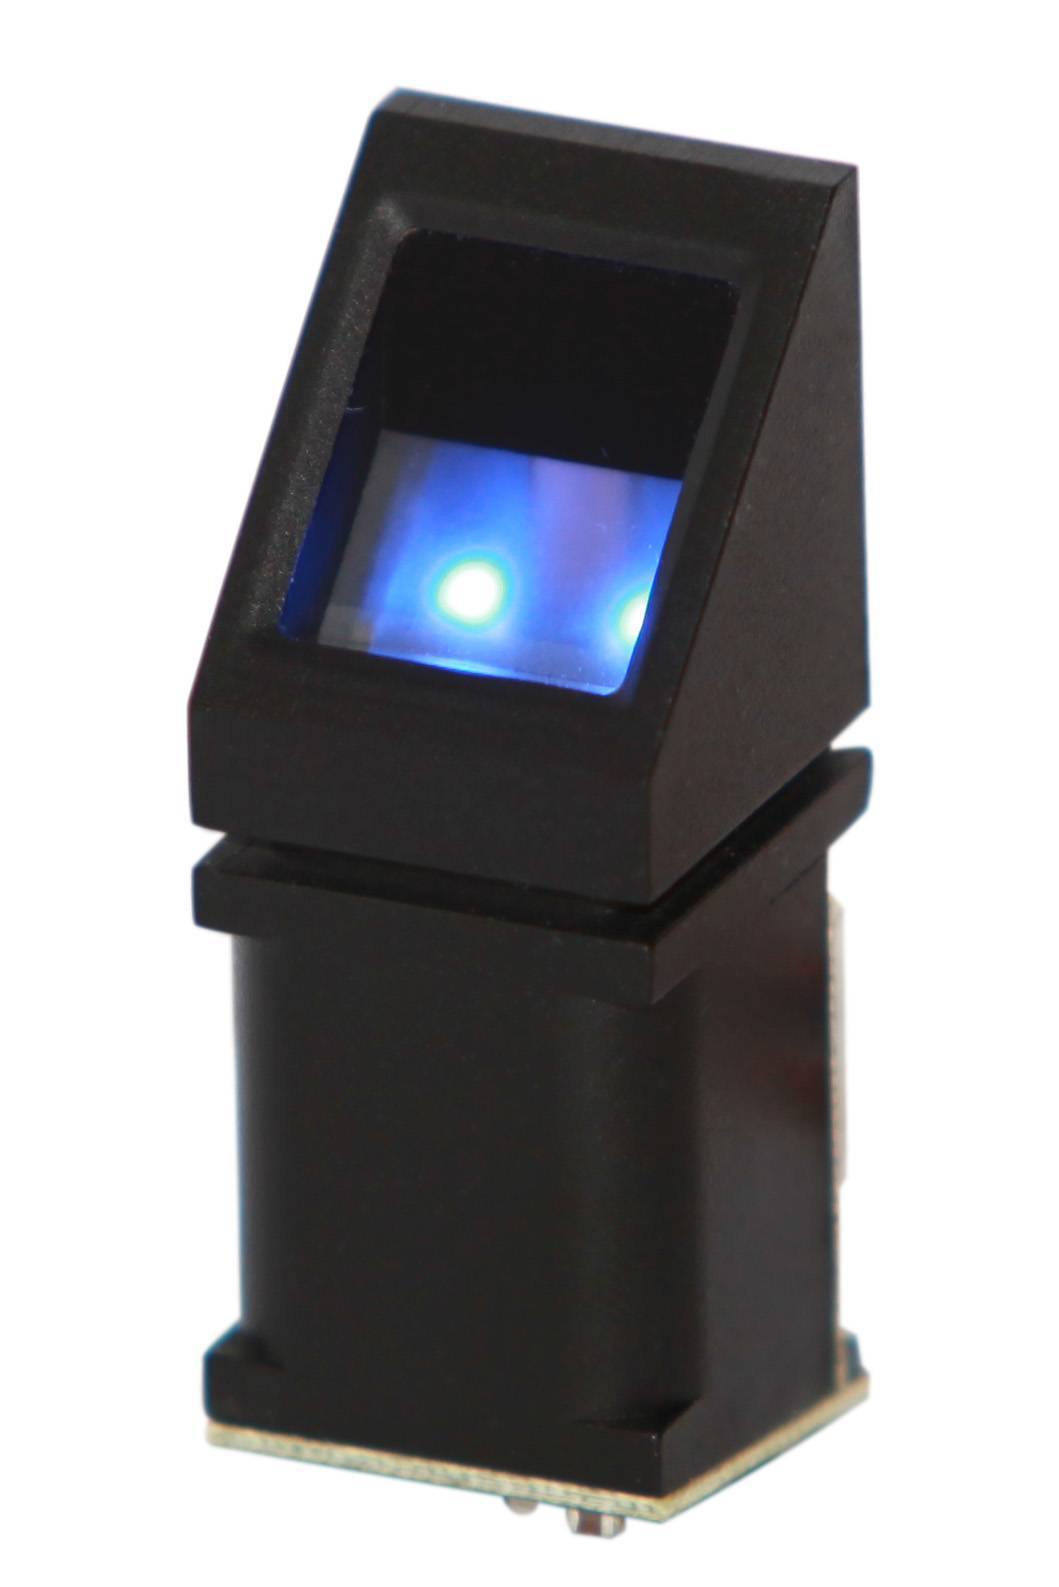 Optical fingerprint module